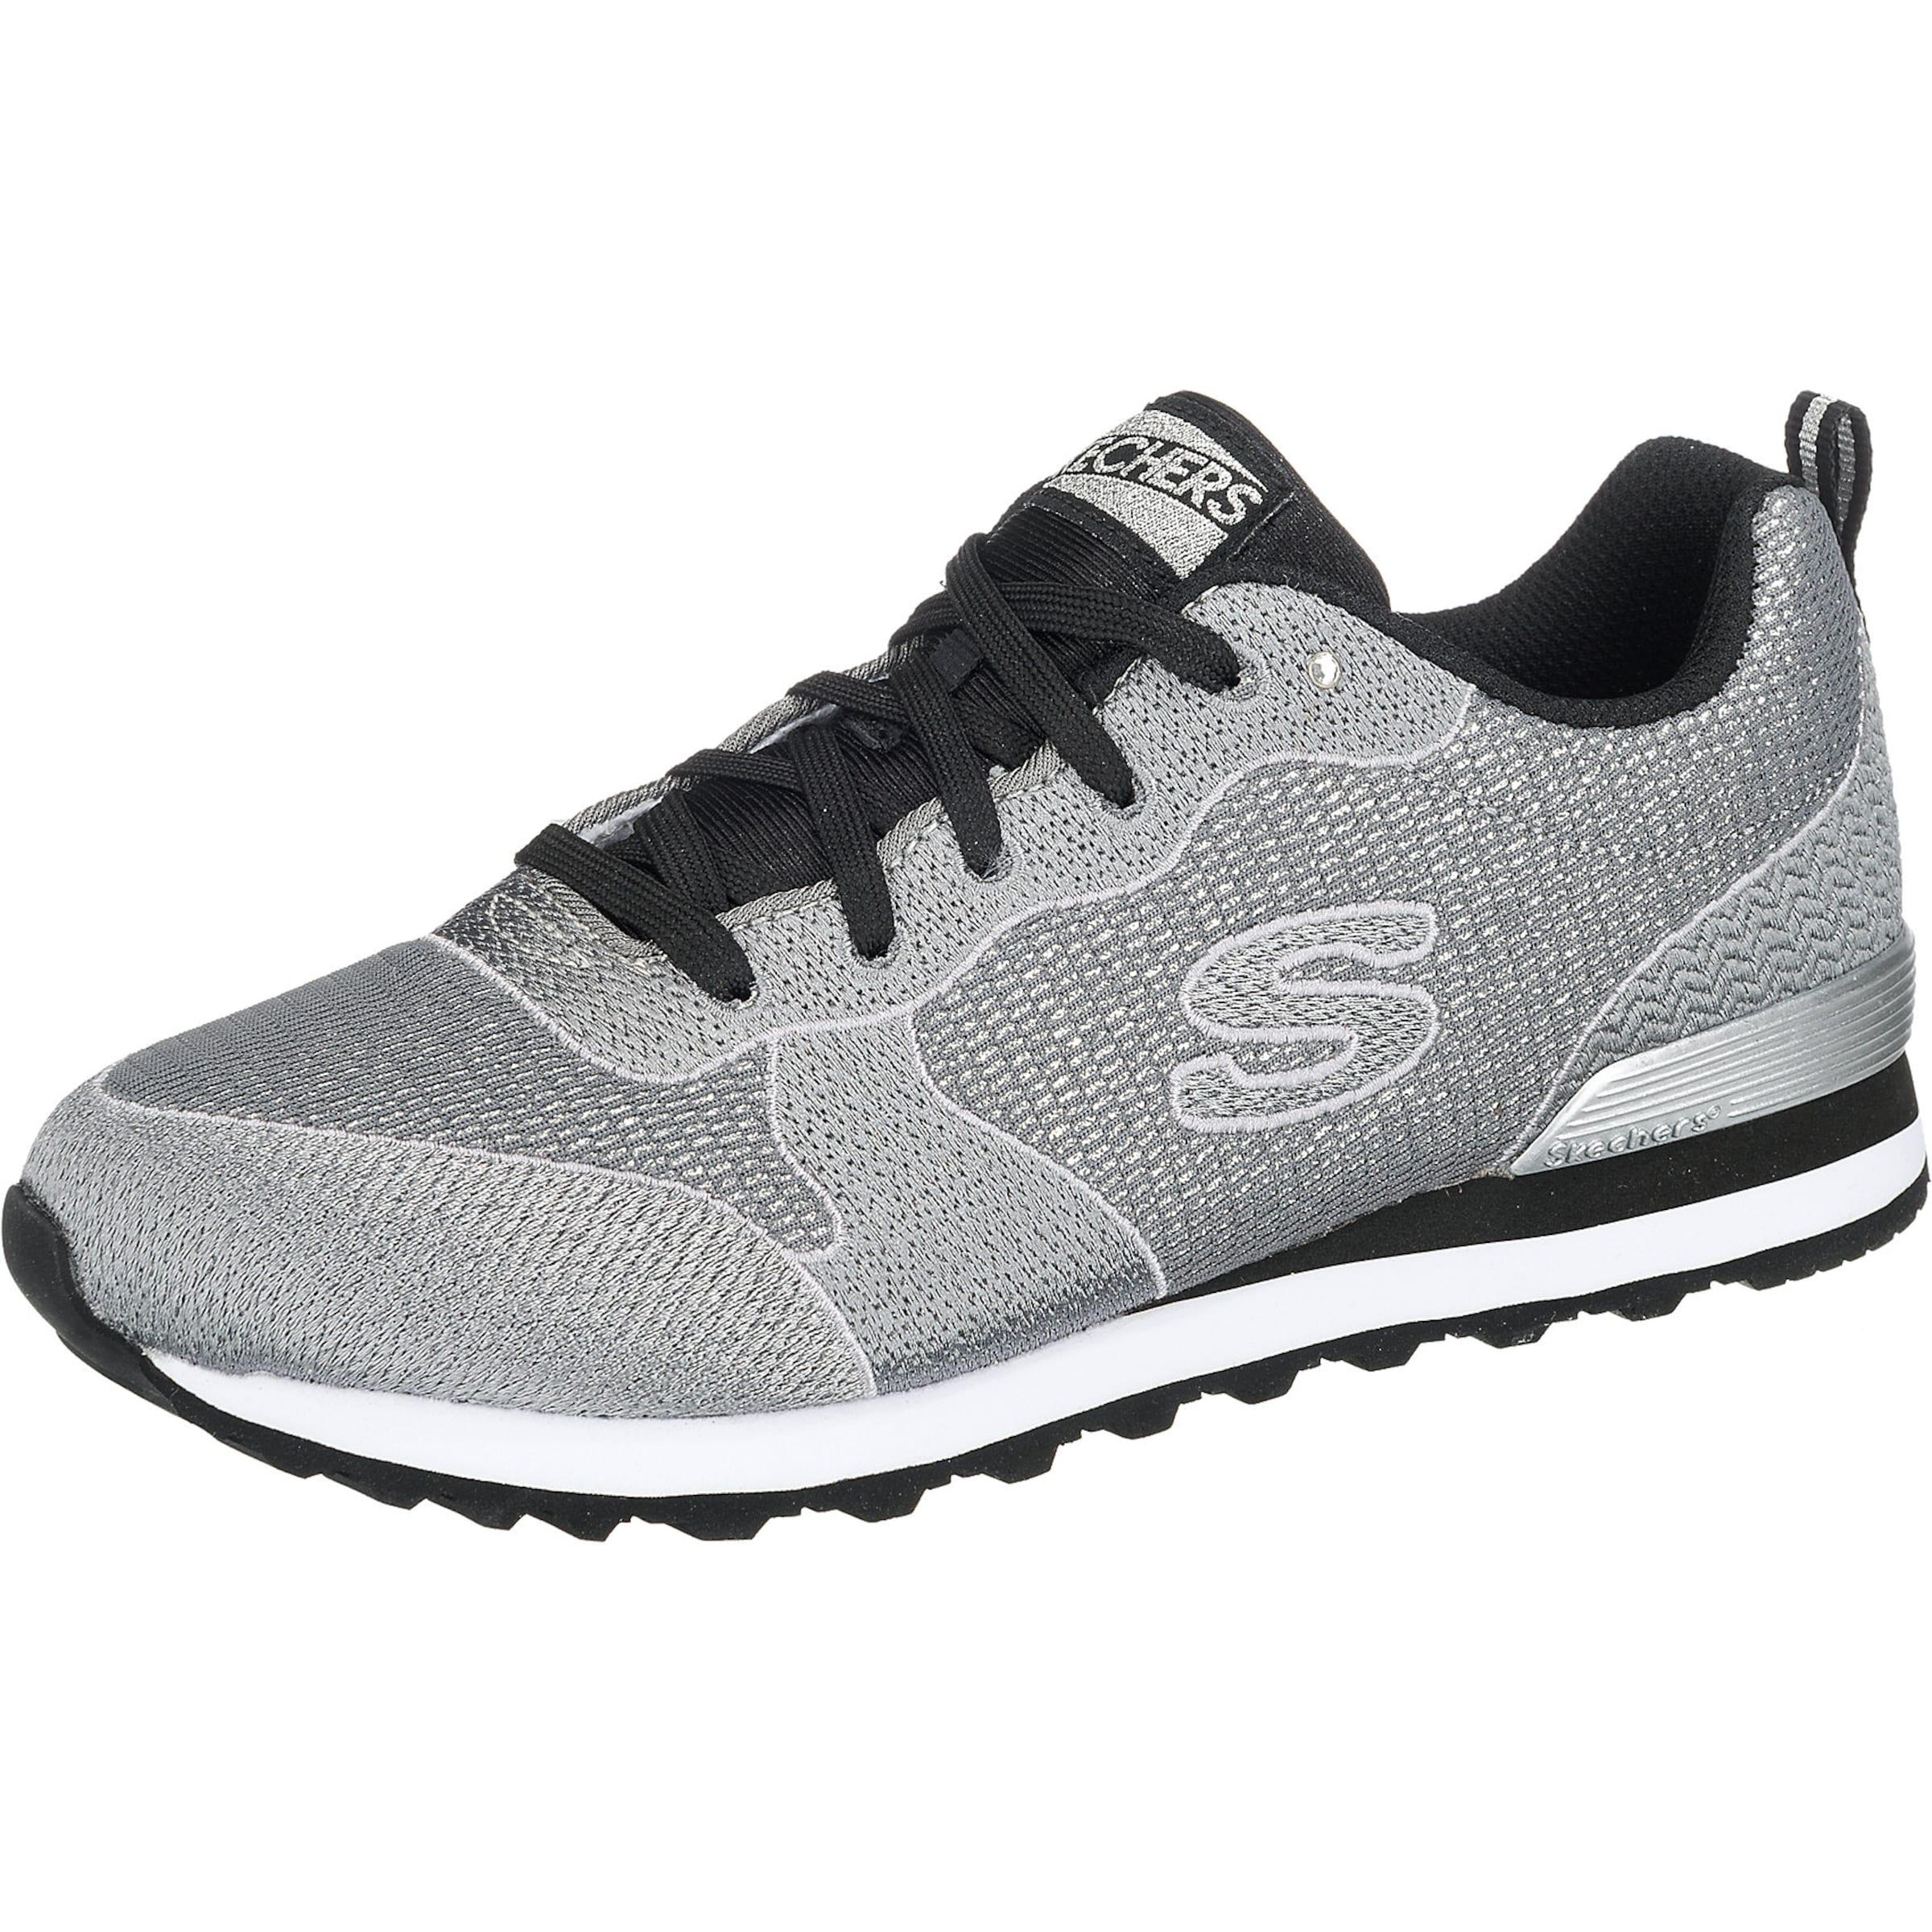 SKECHERS Sneaker Low Retros 85 Hohe Qualität